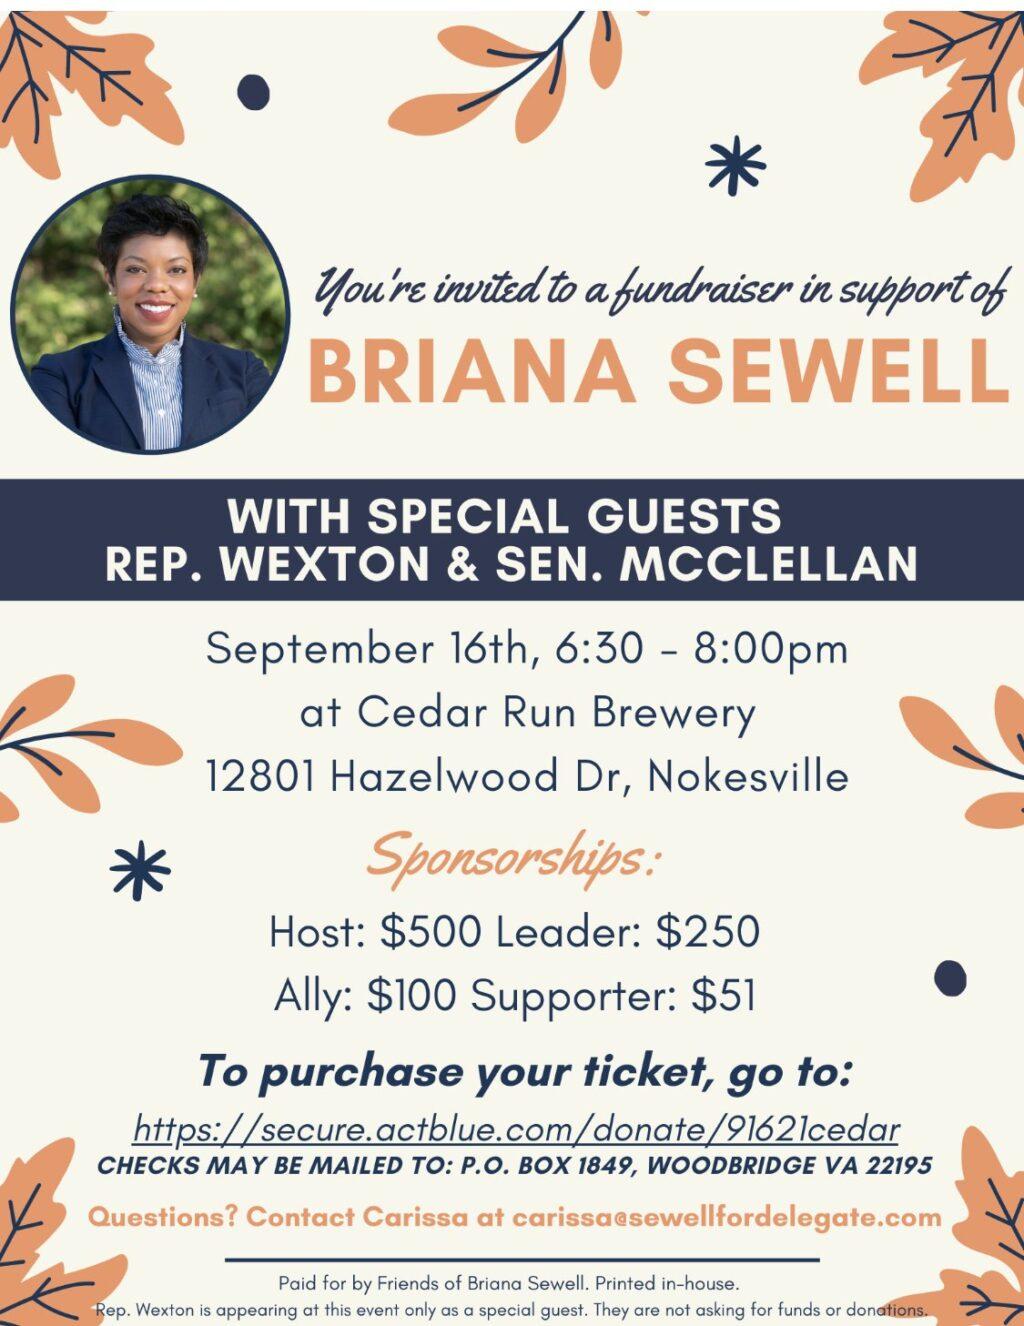 Briana Sewell Fundraiser